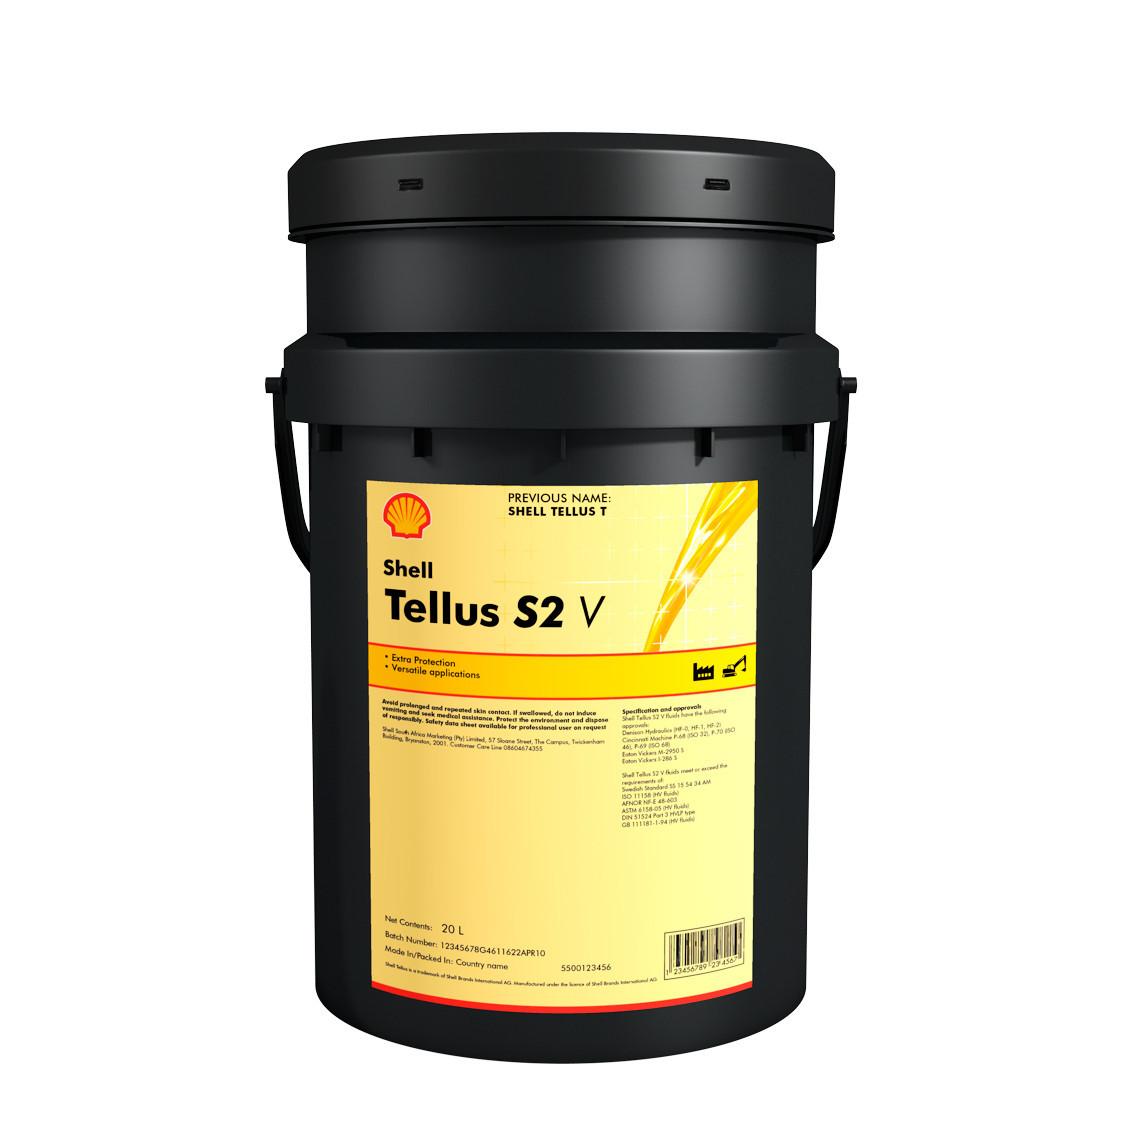 SHELL Tellus S2 V 46 (20 л)